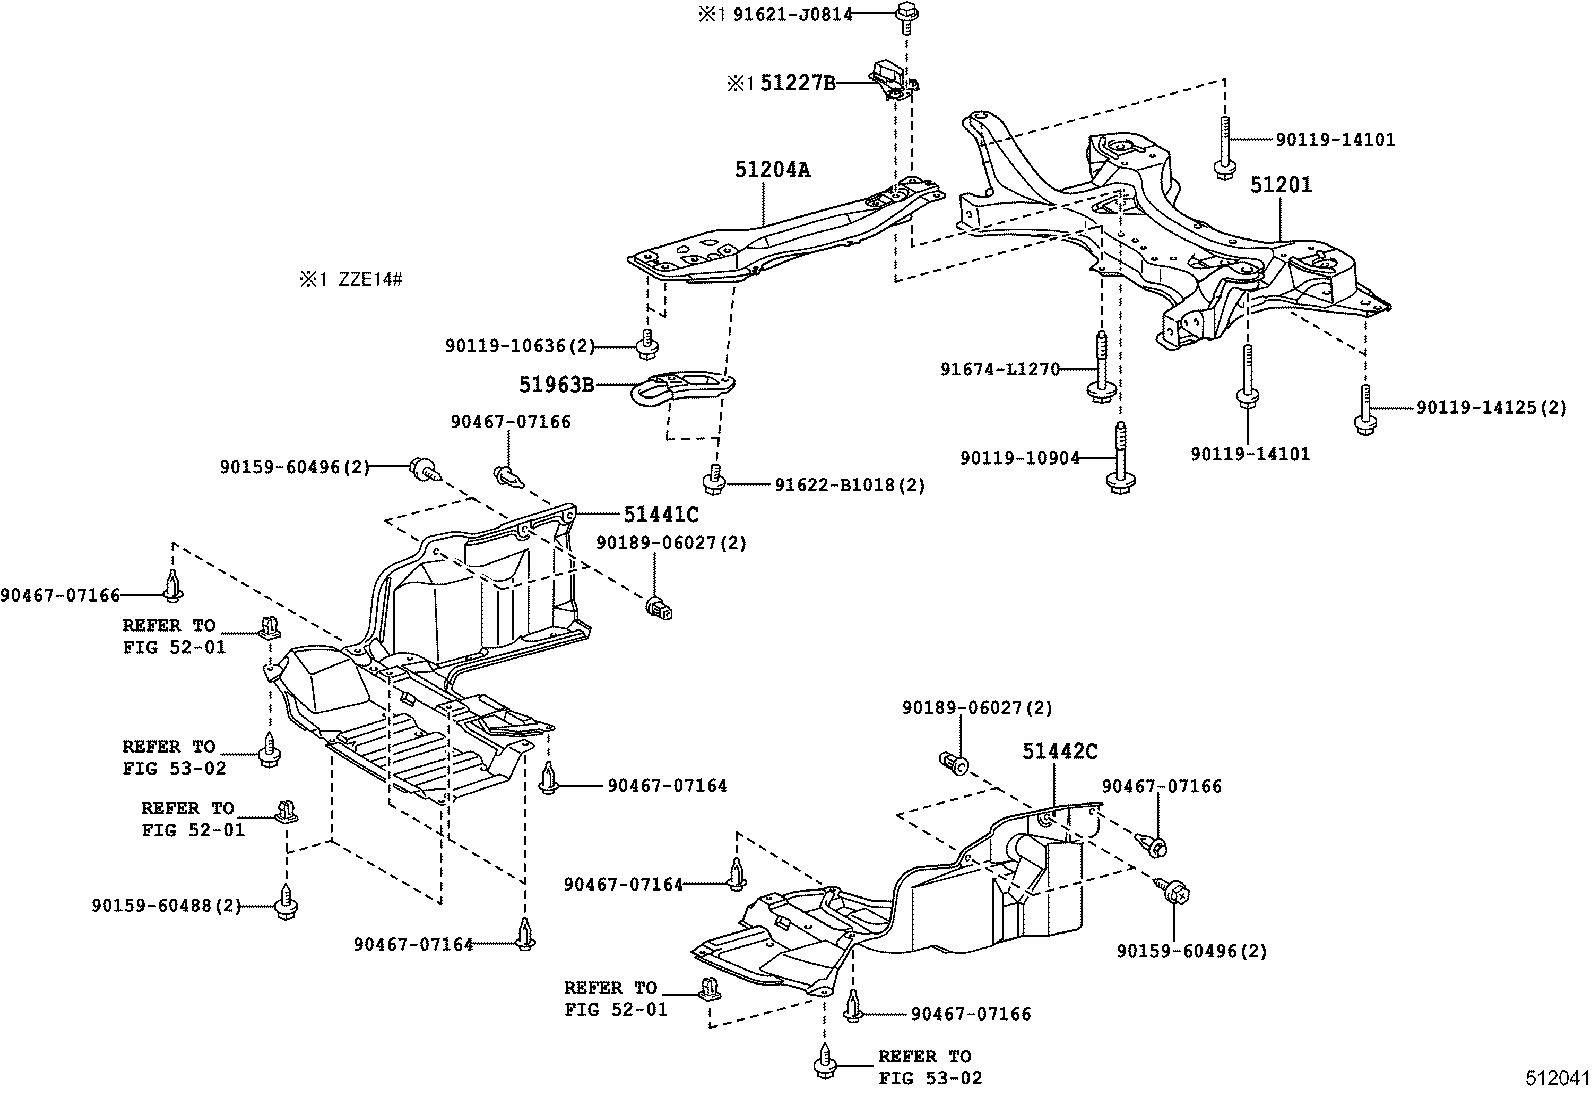 toyota corolla altiszre142l-gepdkg - body